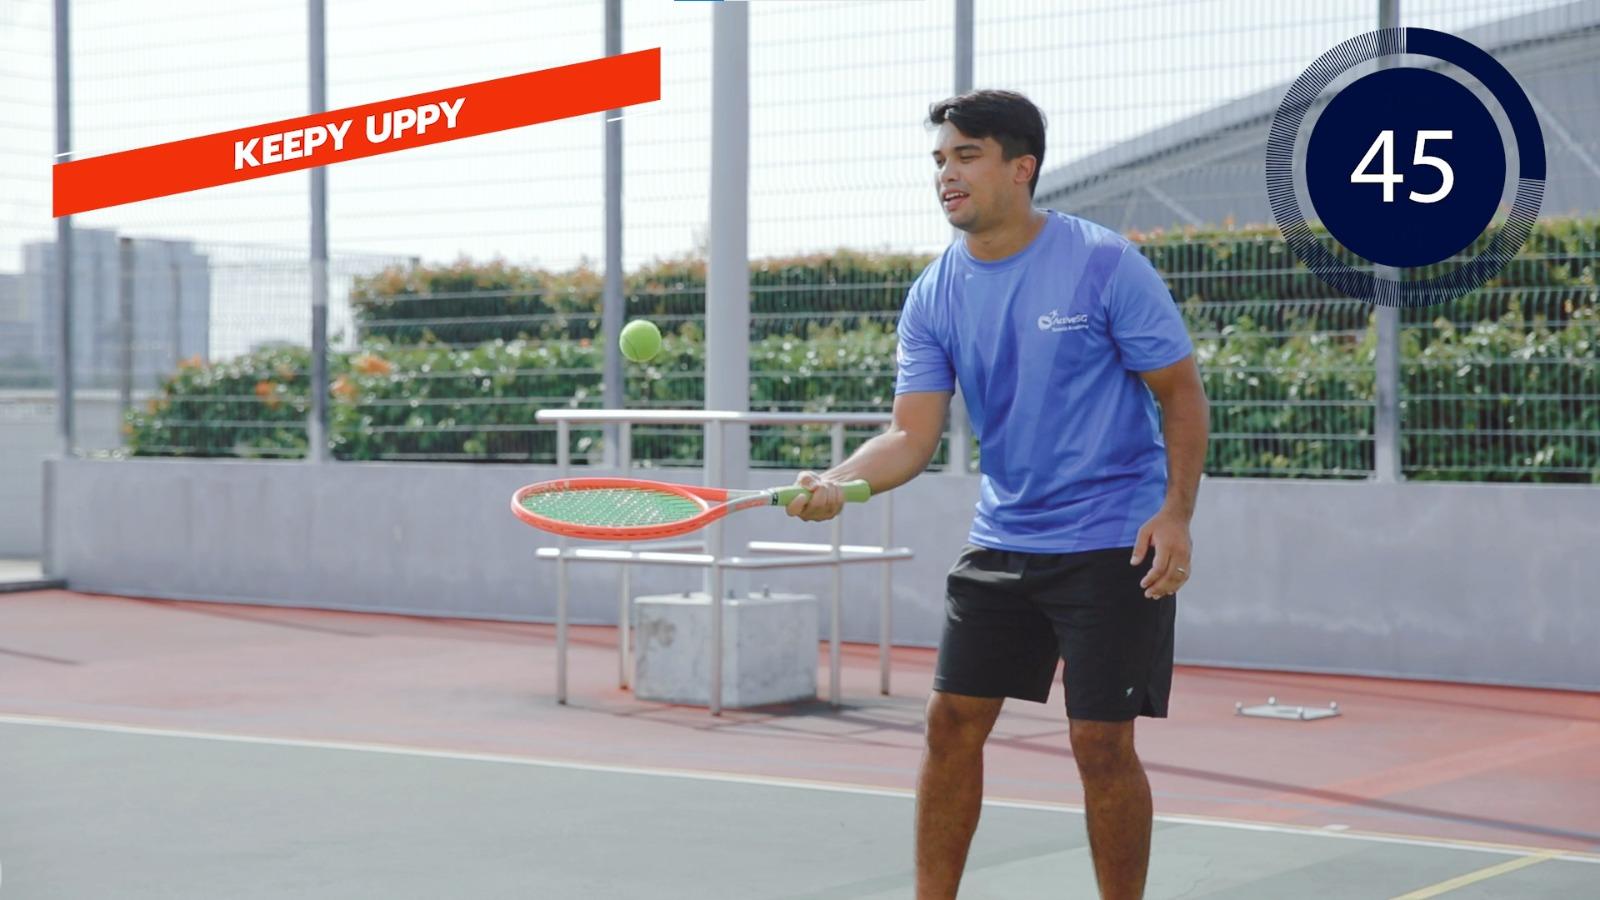 tennis keeppy uppy